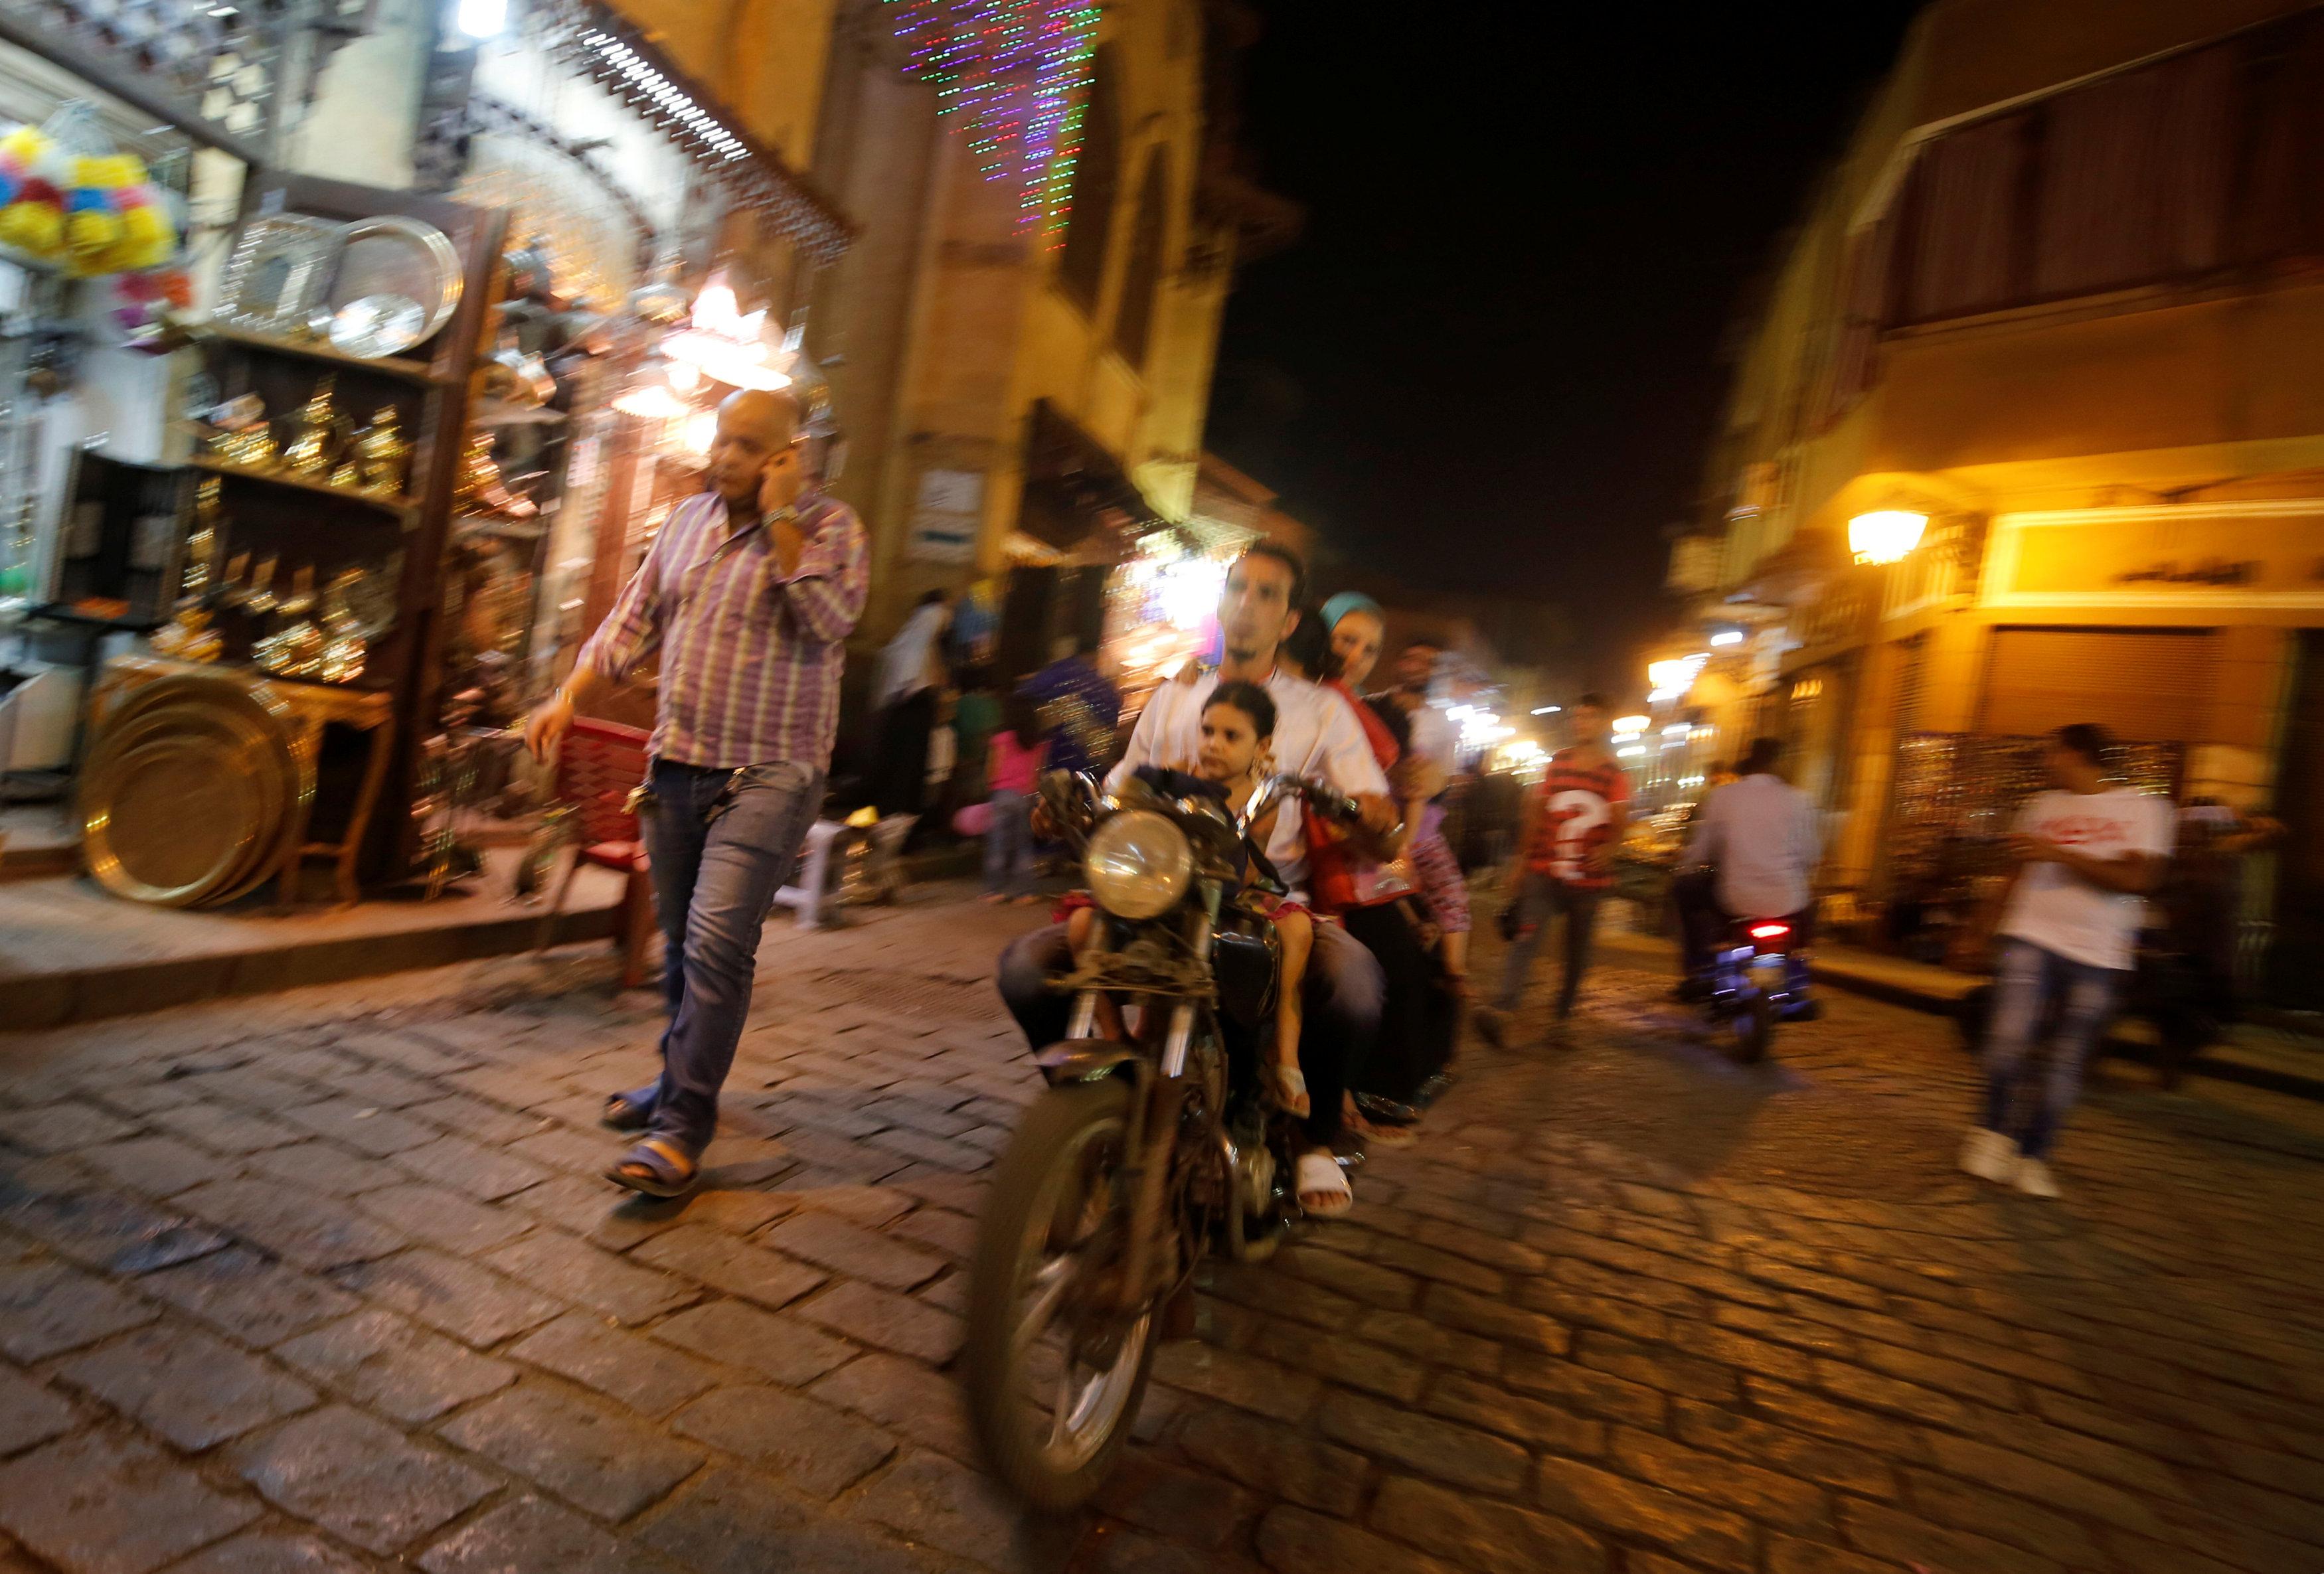 In Egypt, International Monetary Fund deal brings austerity few can afford